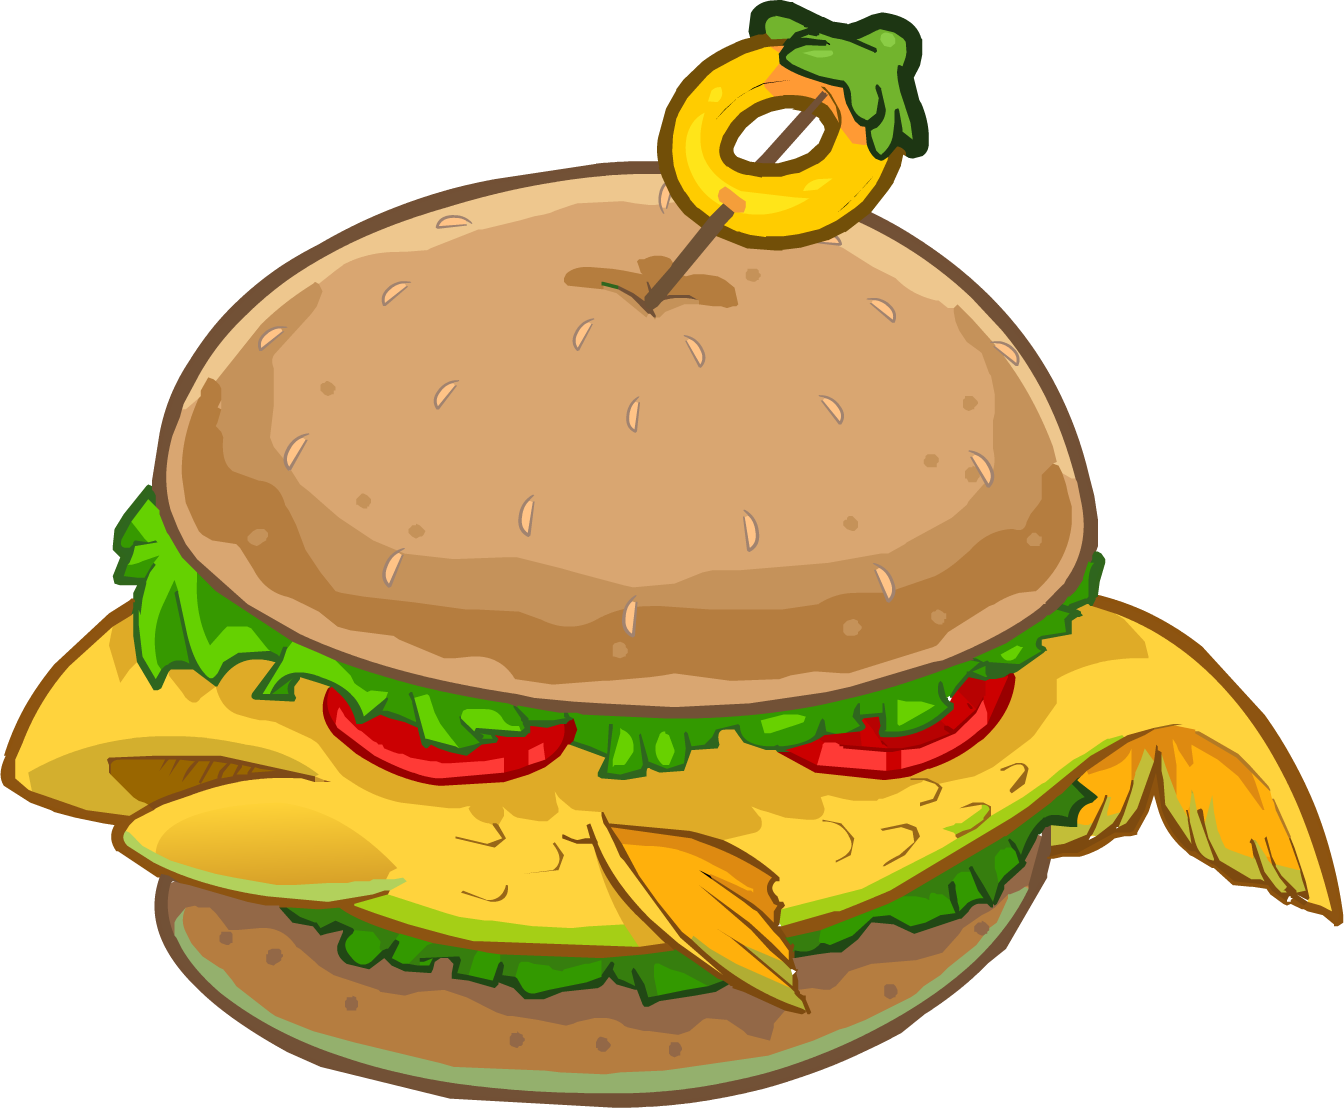 Fish Burger Club Penguin Wiki Fandom Powered By Wikia